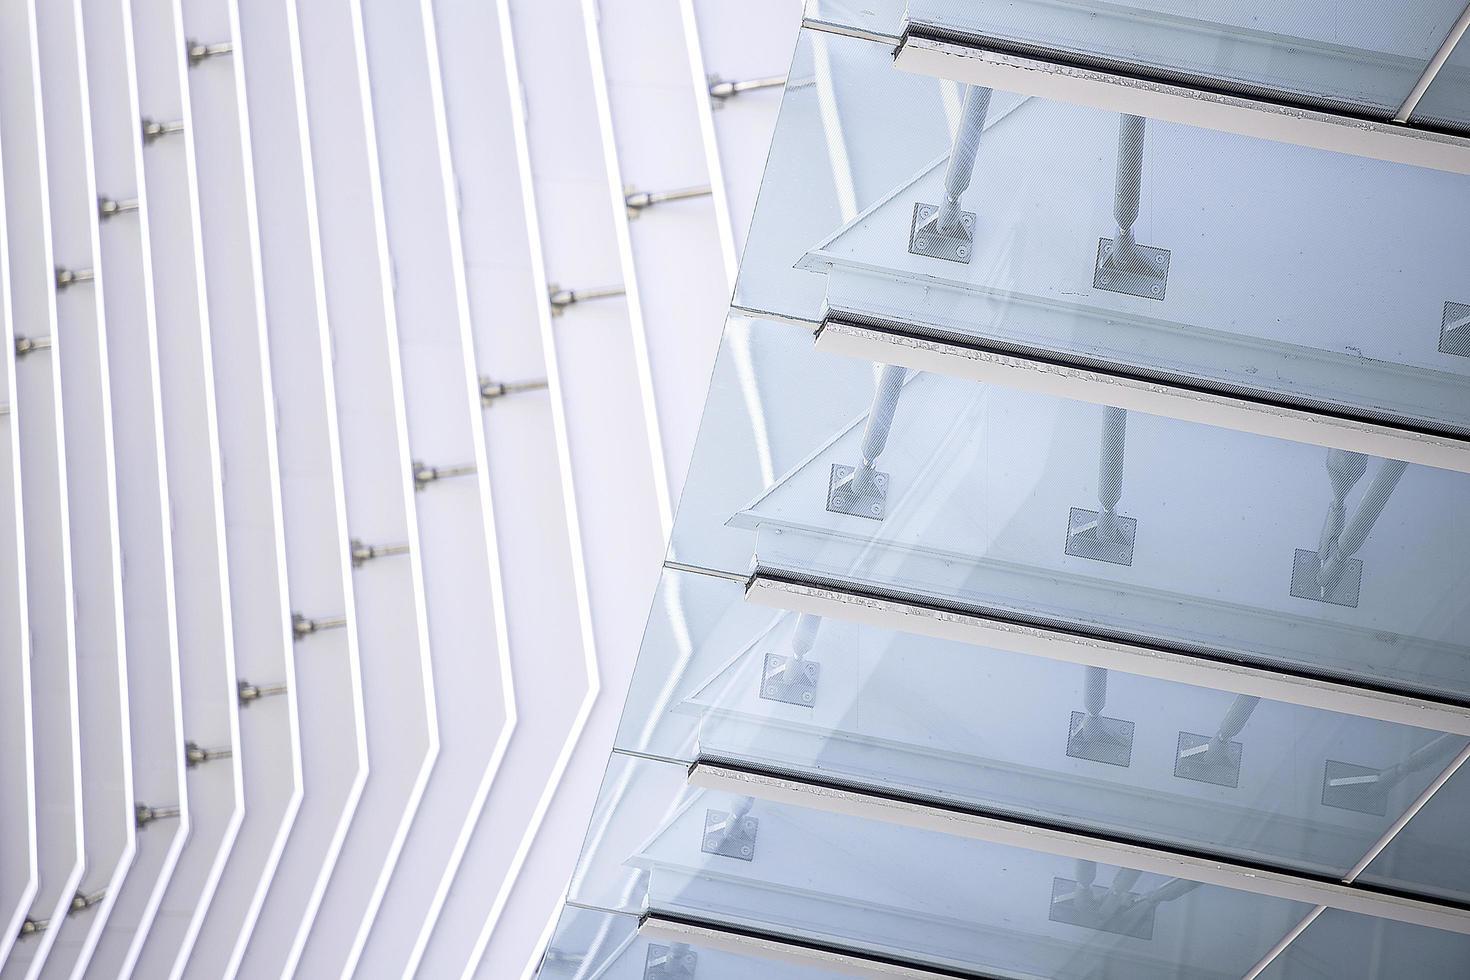 Miami, Florida, 2020 - Close-up of modern building photo